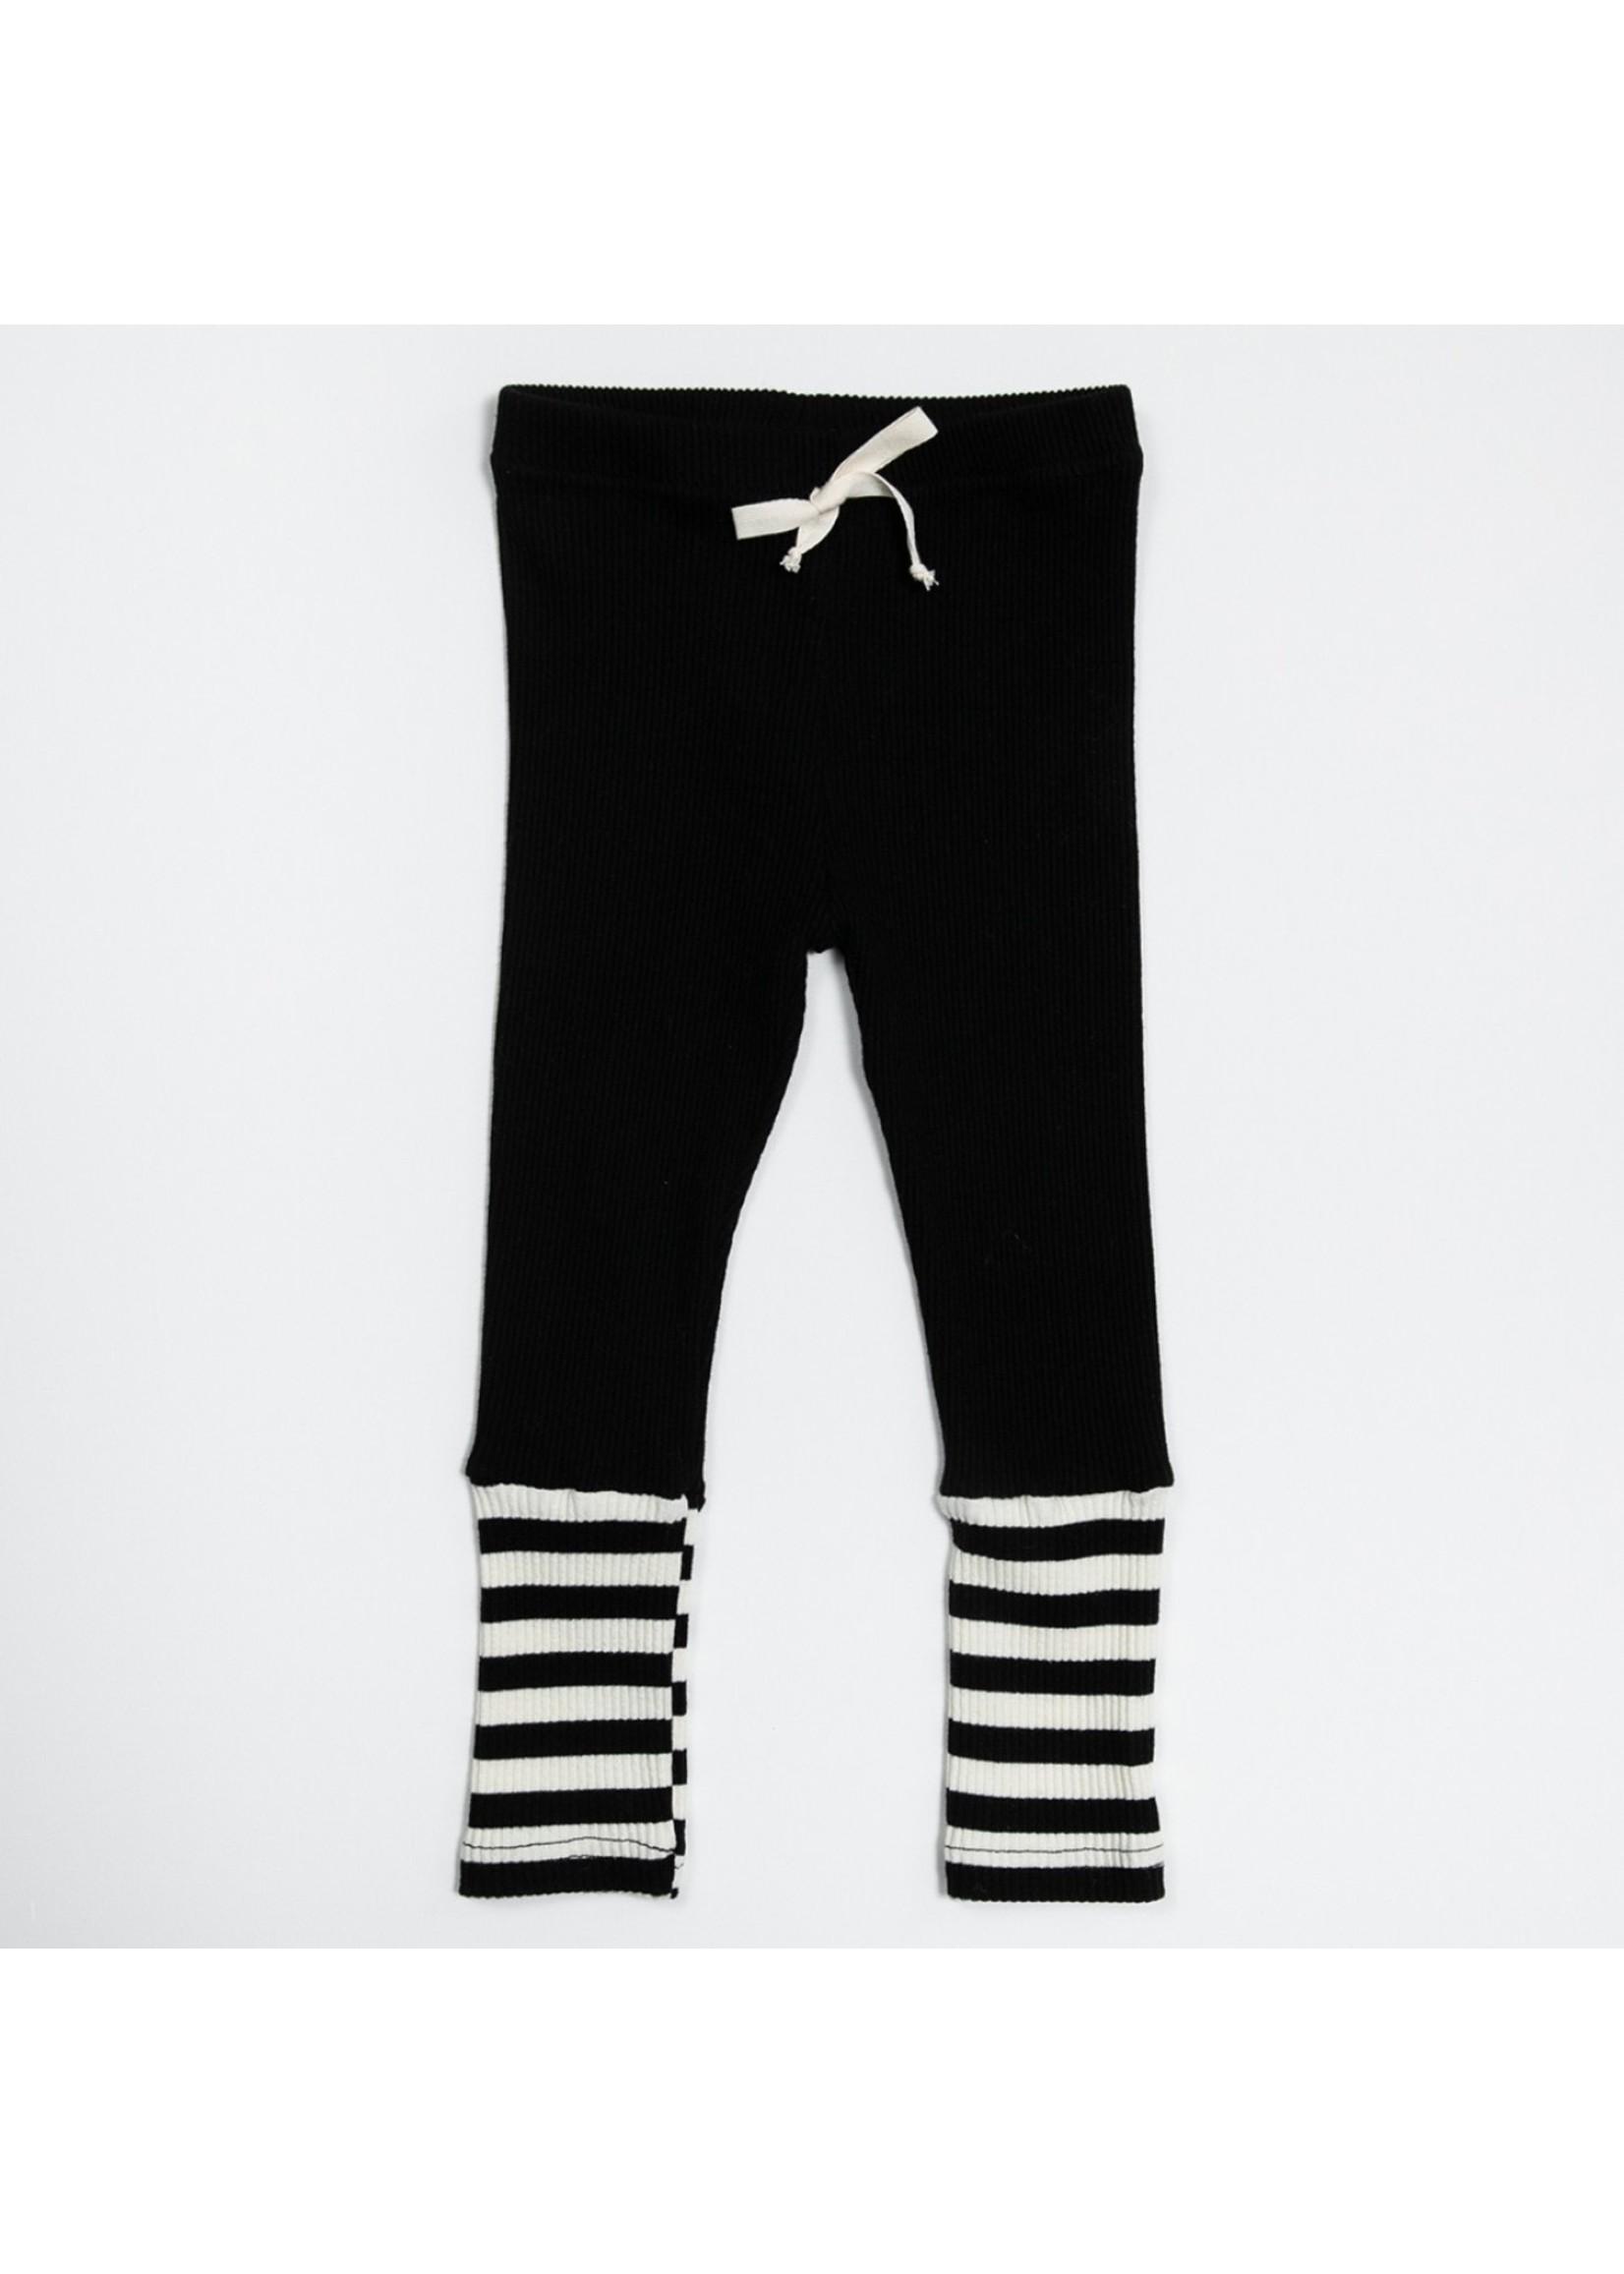 Petite Hailey PH Ava Legging (Black)